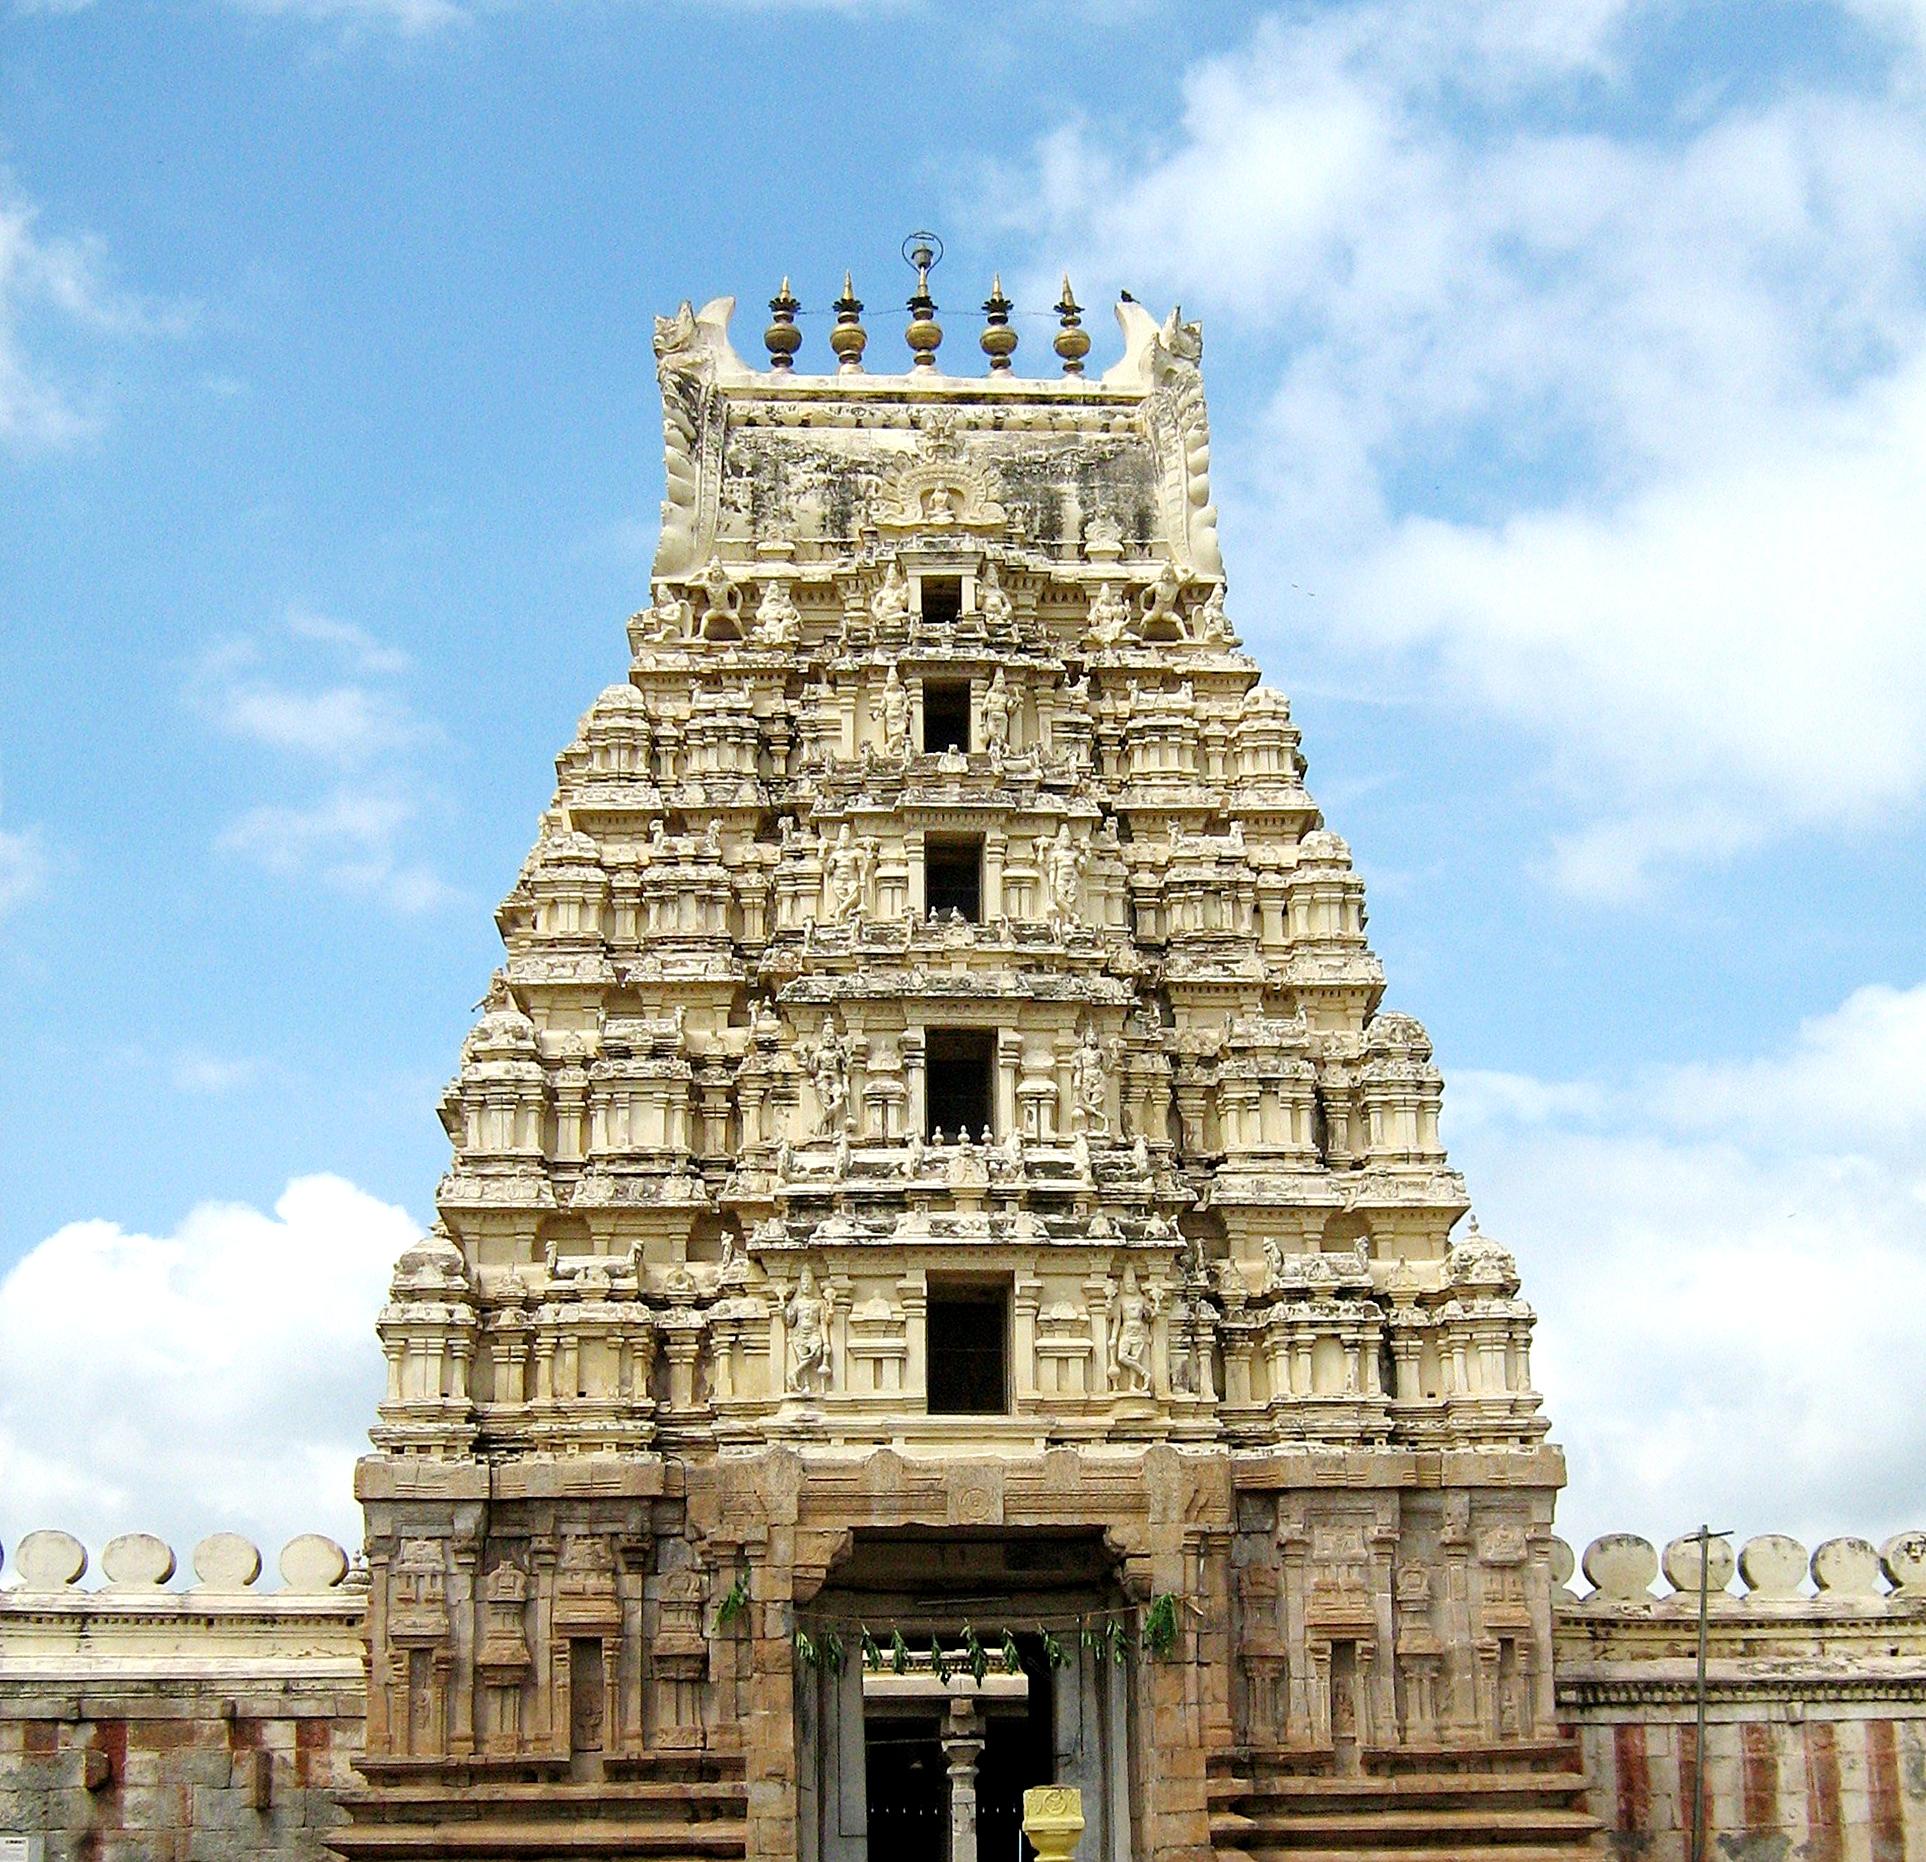 Sri Ranganathaswamy Temple - Nellore Image